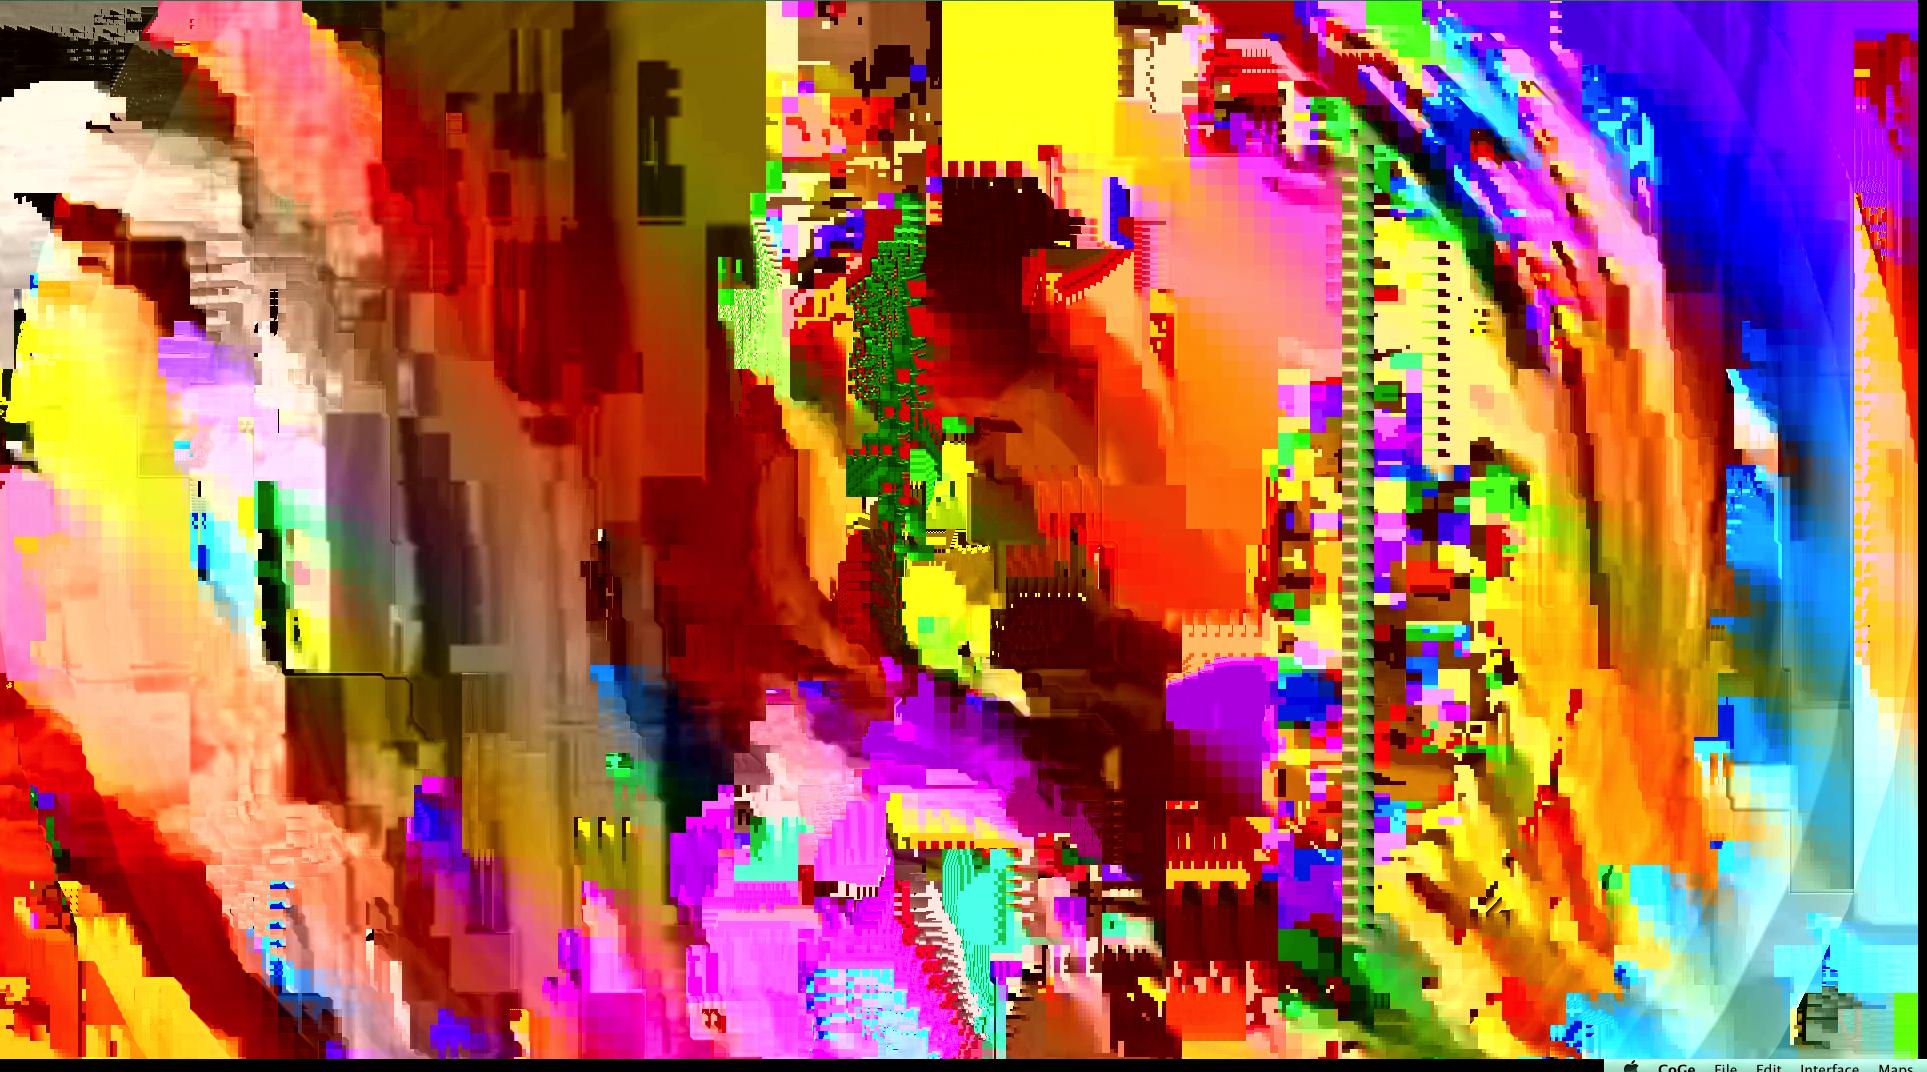 Screenshot 2013-12-27 01.01.31